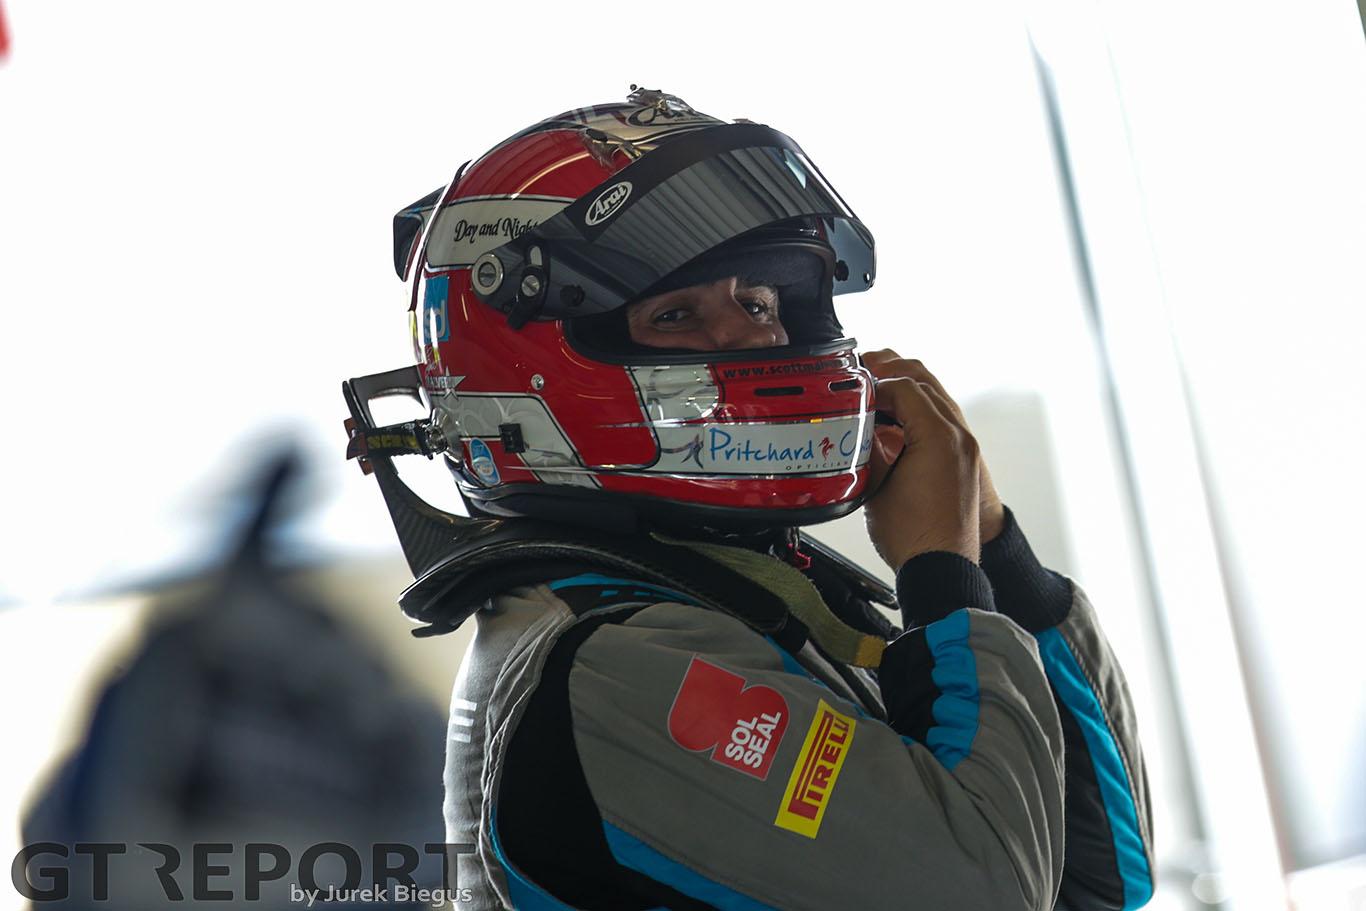 British GT Oulton Park: Paddock and Team Parker claim GT3 poles, Newbridge sweeps GT4